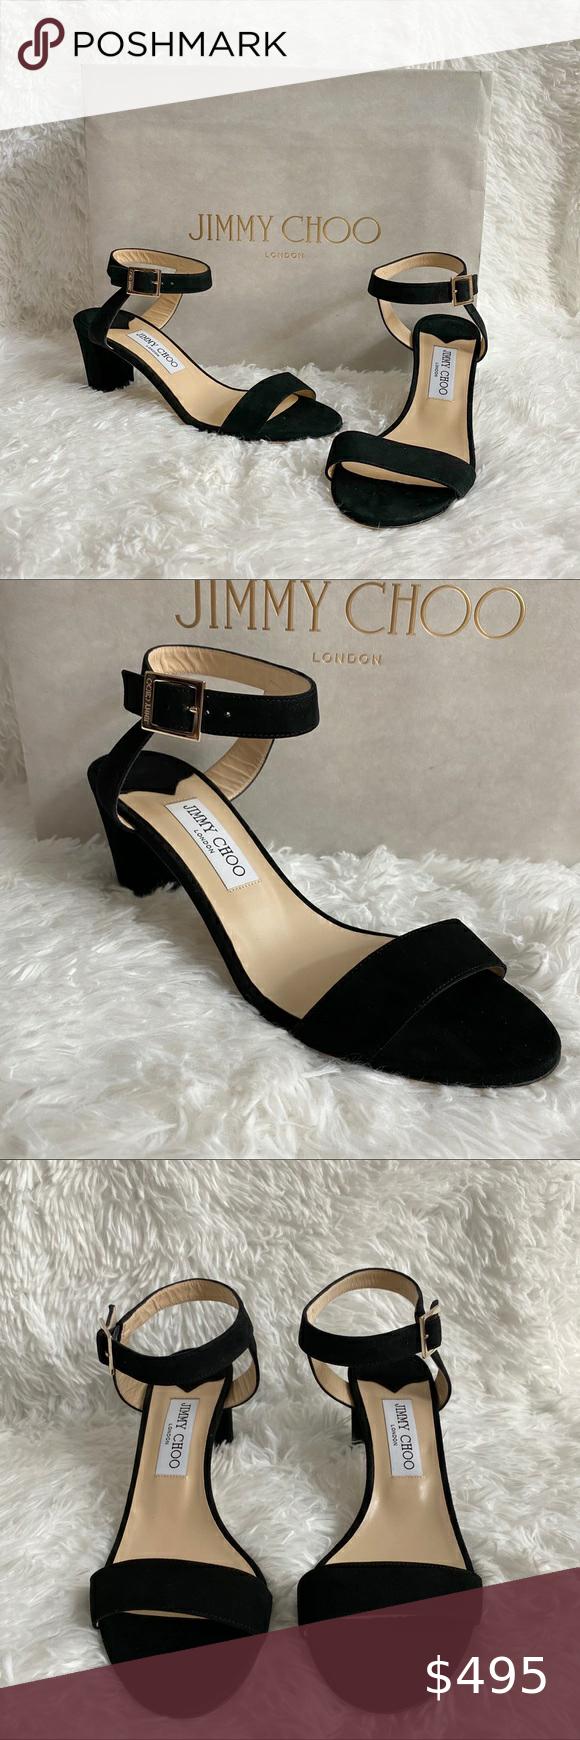 NWT Jimmy Choo City Sandal Black Suede